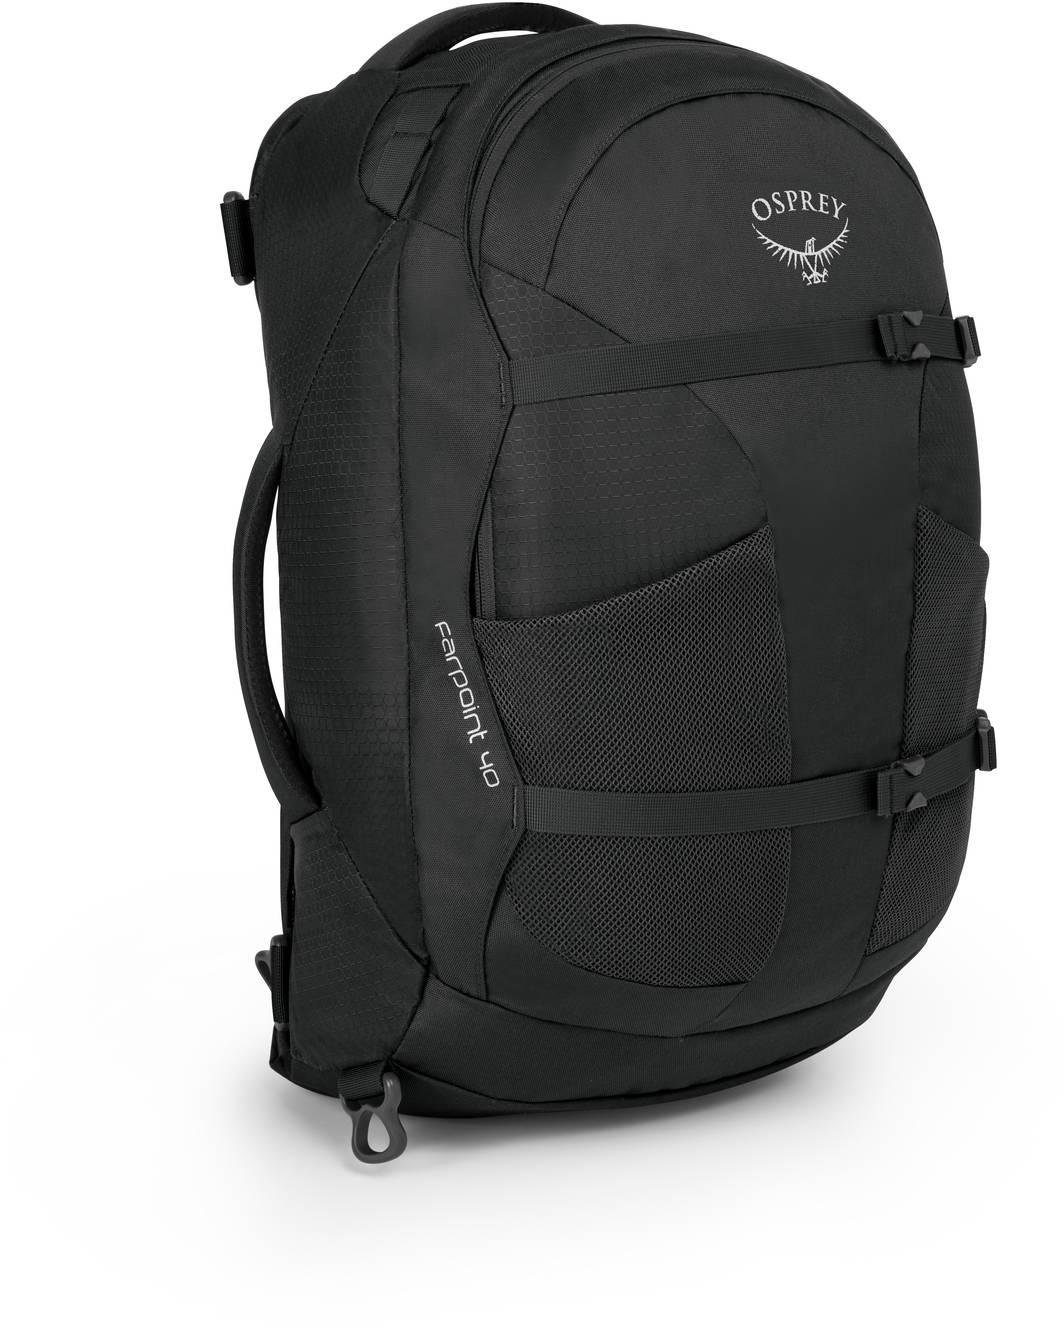 Сумки-рюкзаки Сумка рюкзак Osprey Farpoint 40 Farpoint_40_Side_Volcanic_Grey_web.jpg